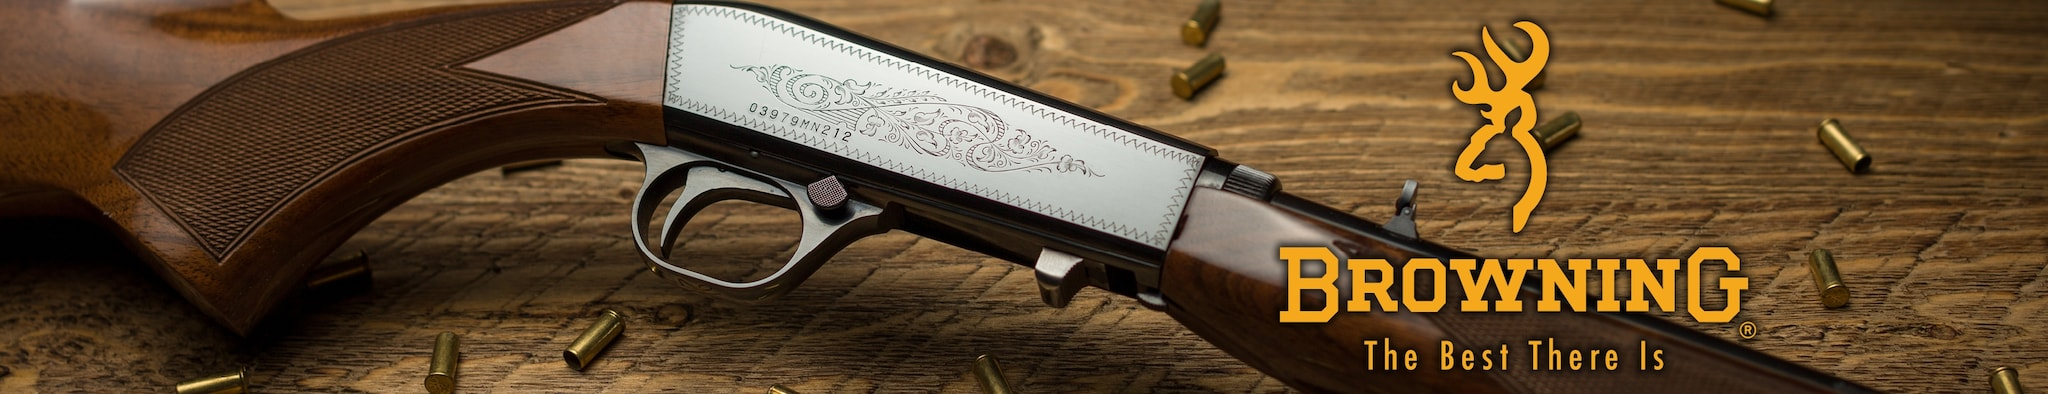 Browning brand image